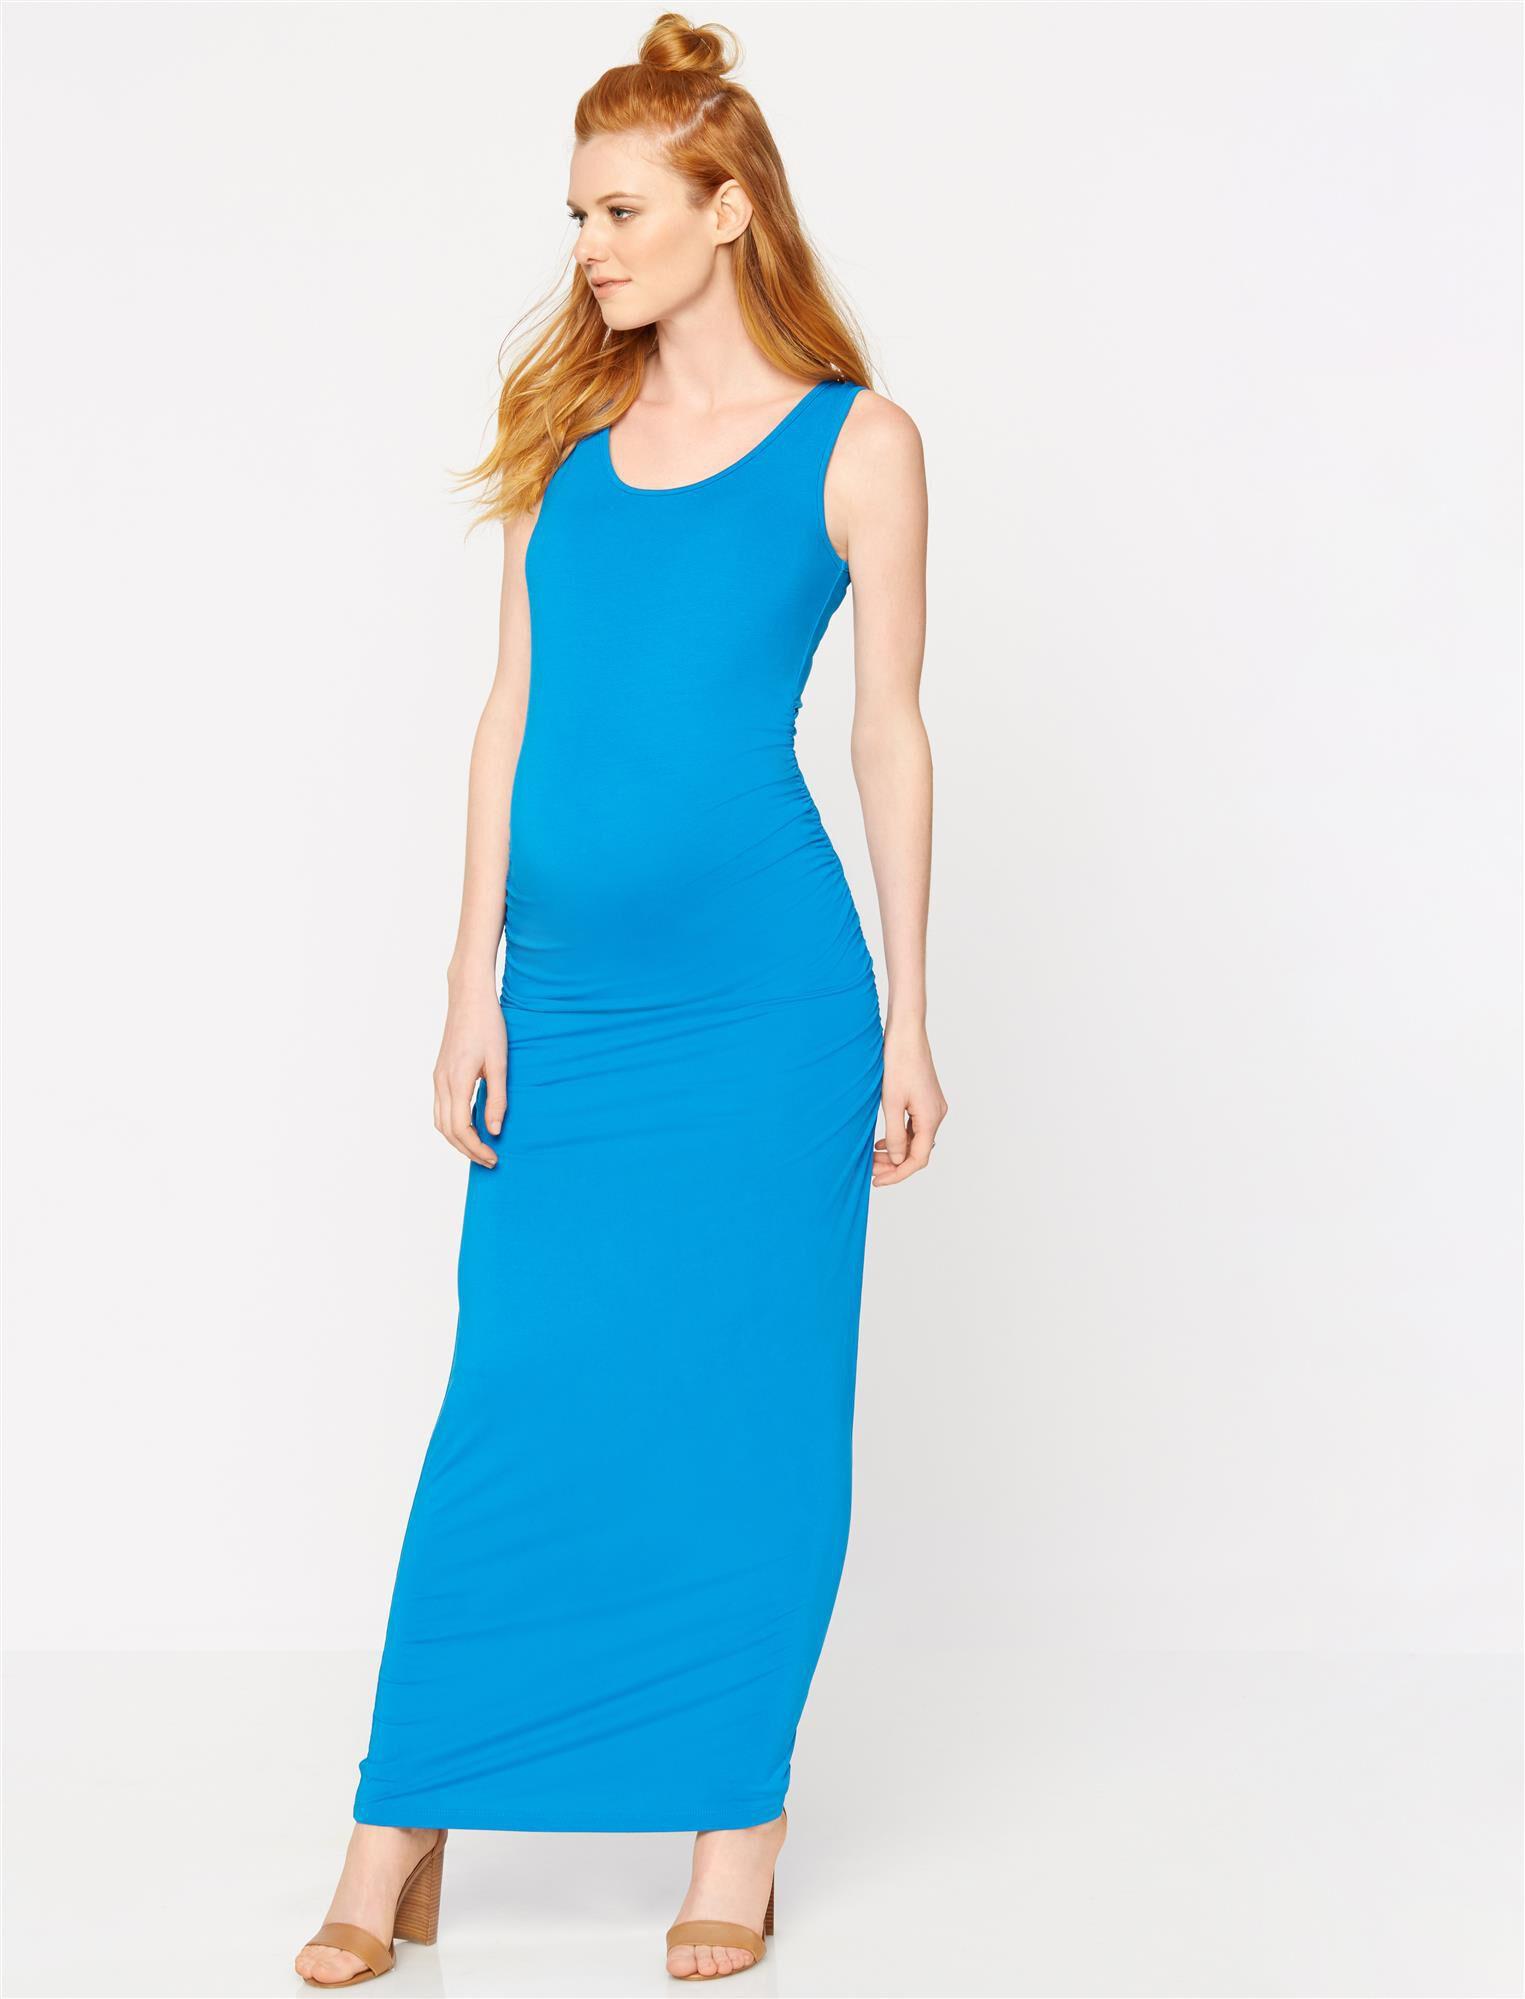 Isabella Oliver Lisle Maternity Maxi Dress- Peacock Blue